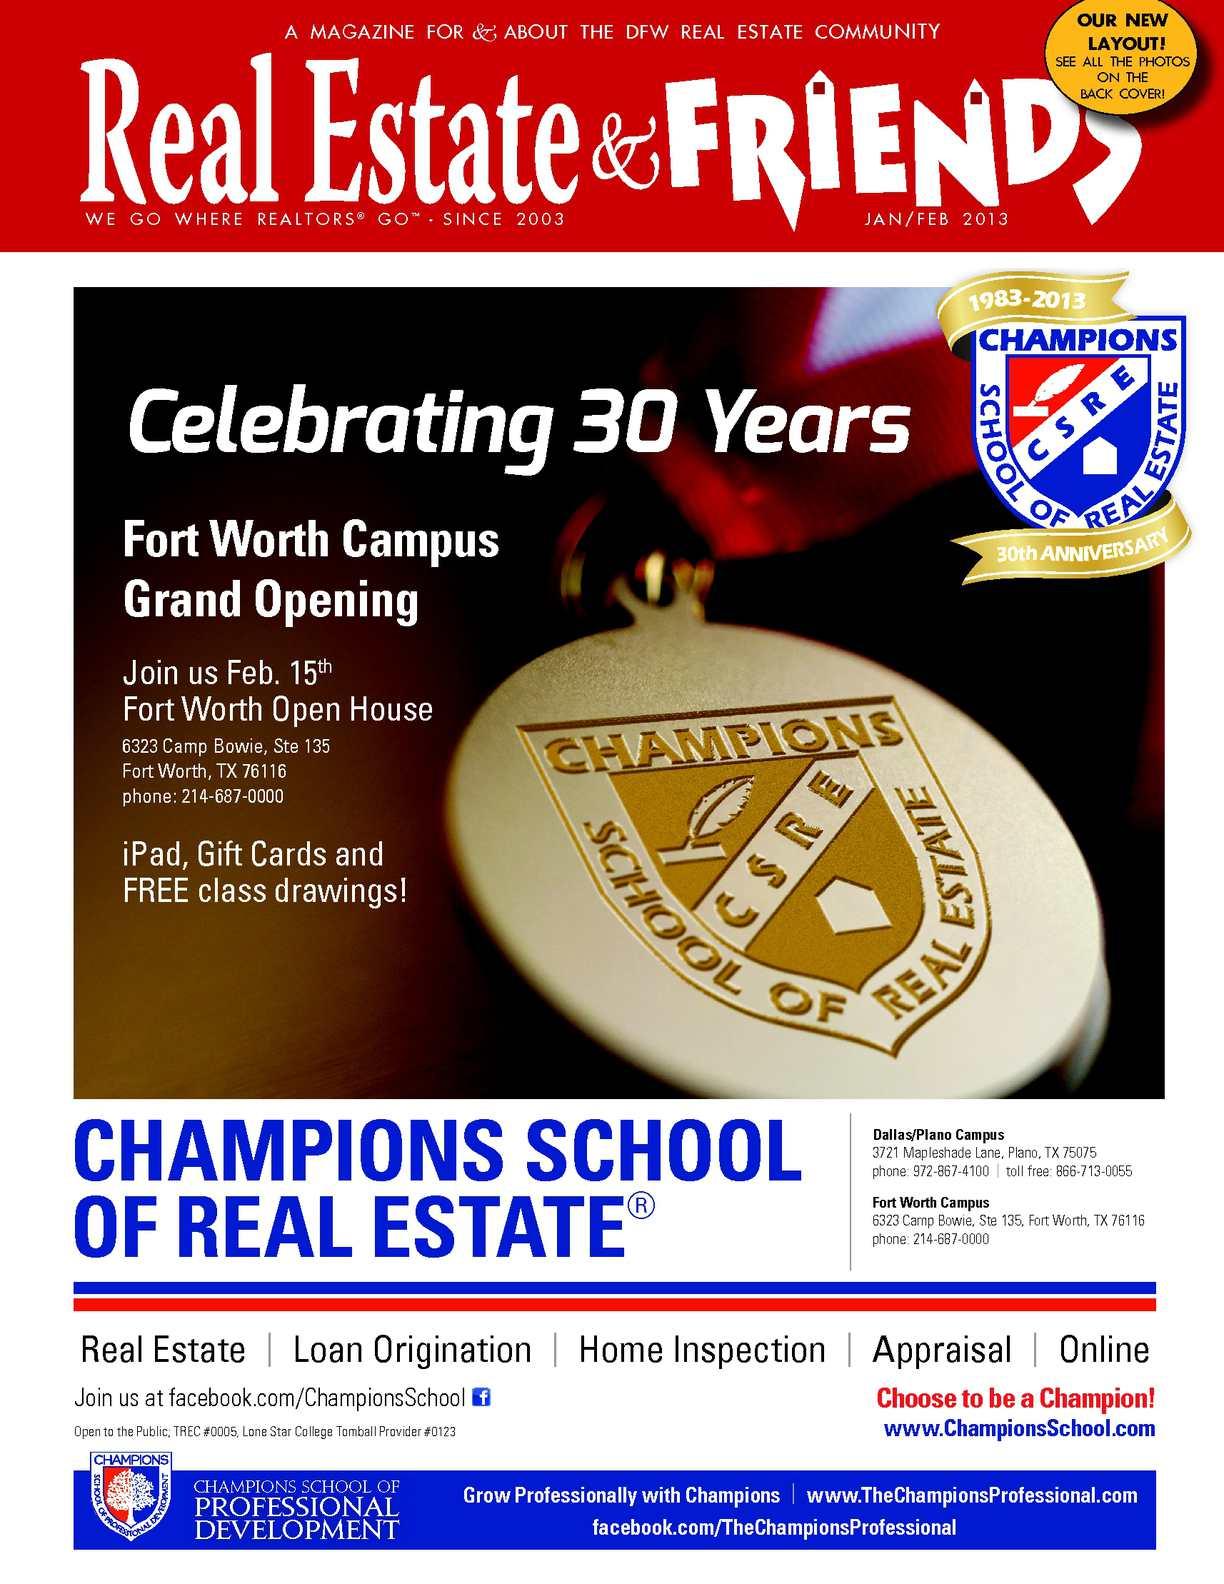 Calaméo Janfeb 2013 Real Estate Friends Magazine